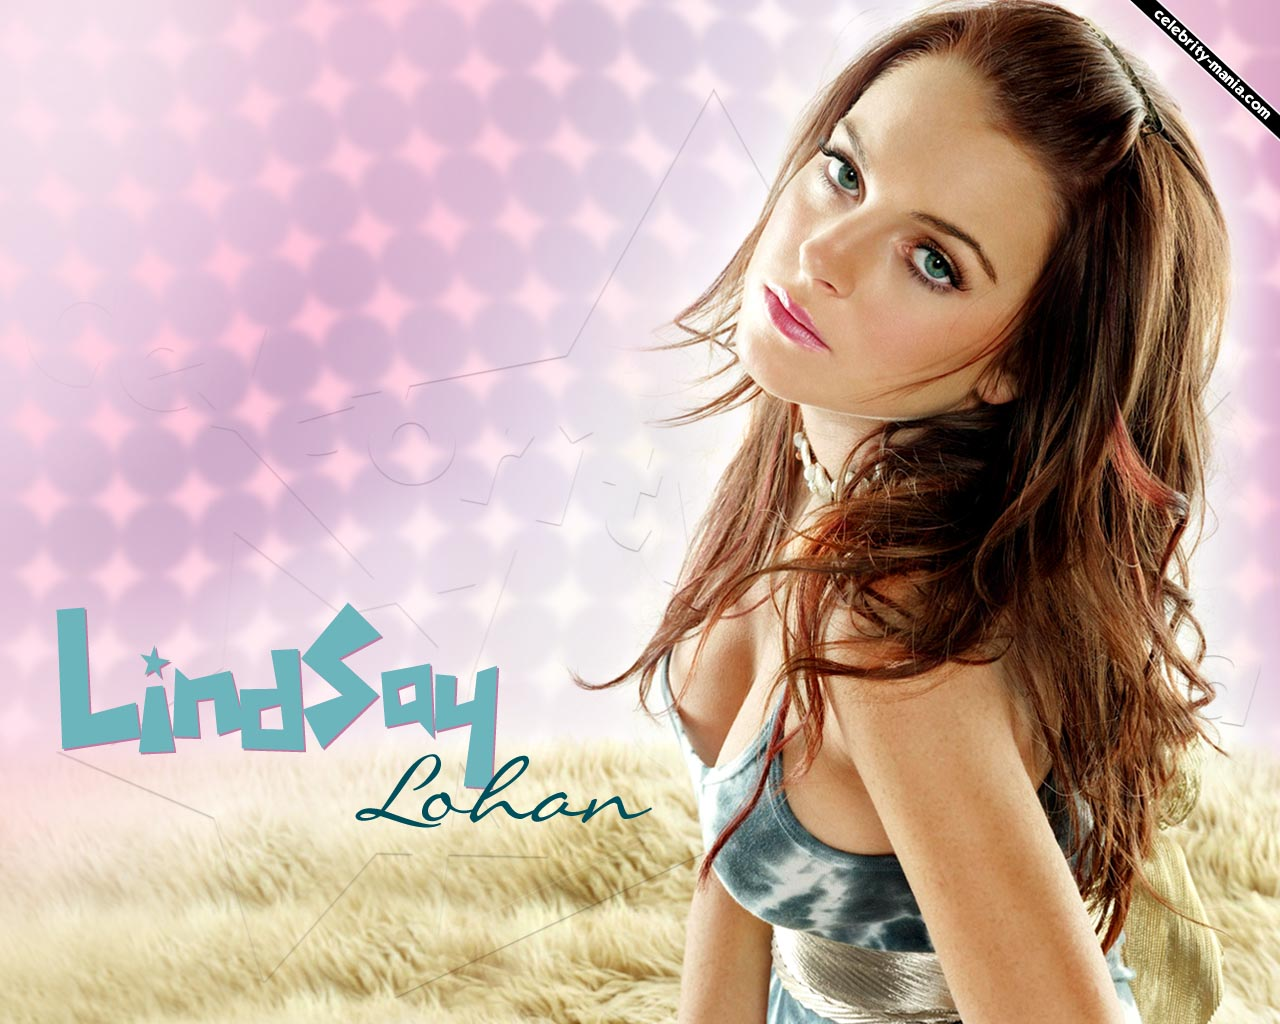 http://4.bp.blogspot.com/-f04KRNEyMKg/UBuEz8bVx0I/AAAAAAAABls/2JHpoy6IMh0/s1600/Lindsay-Lohan-lindsay-lohan.jpg